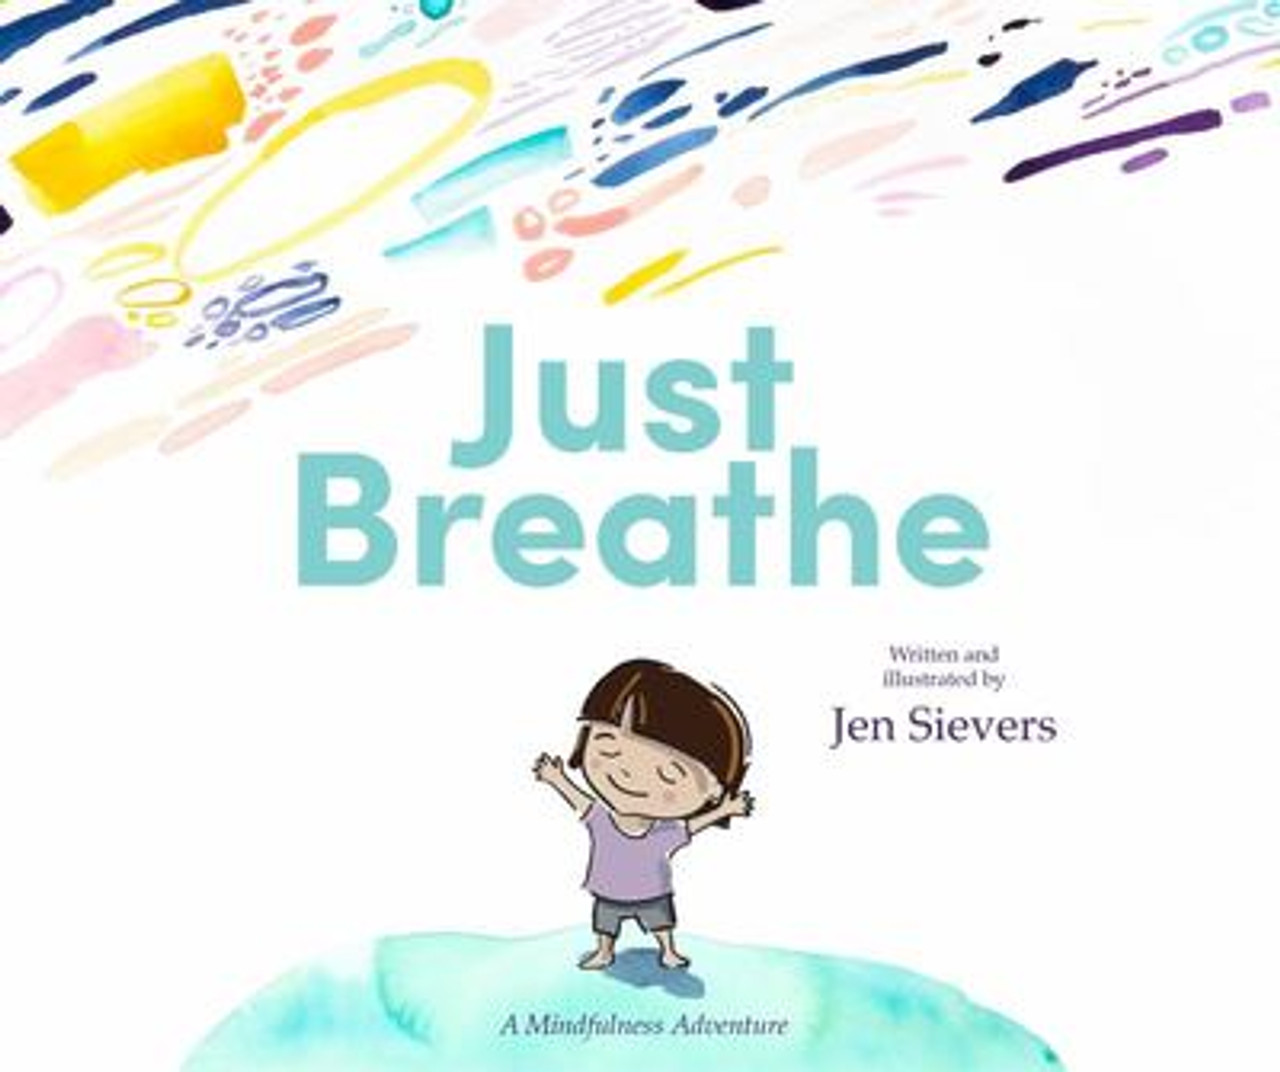 Just Breathe: A Mindfulness Adventure